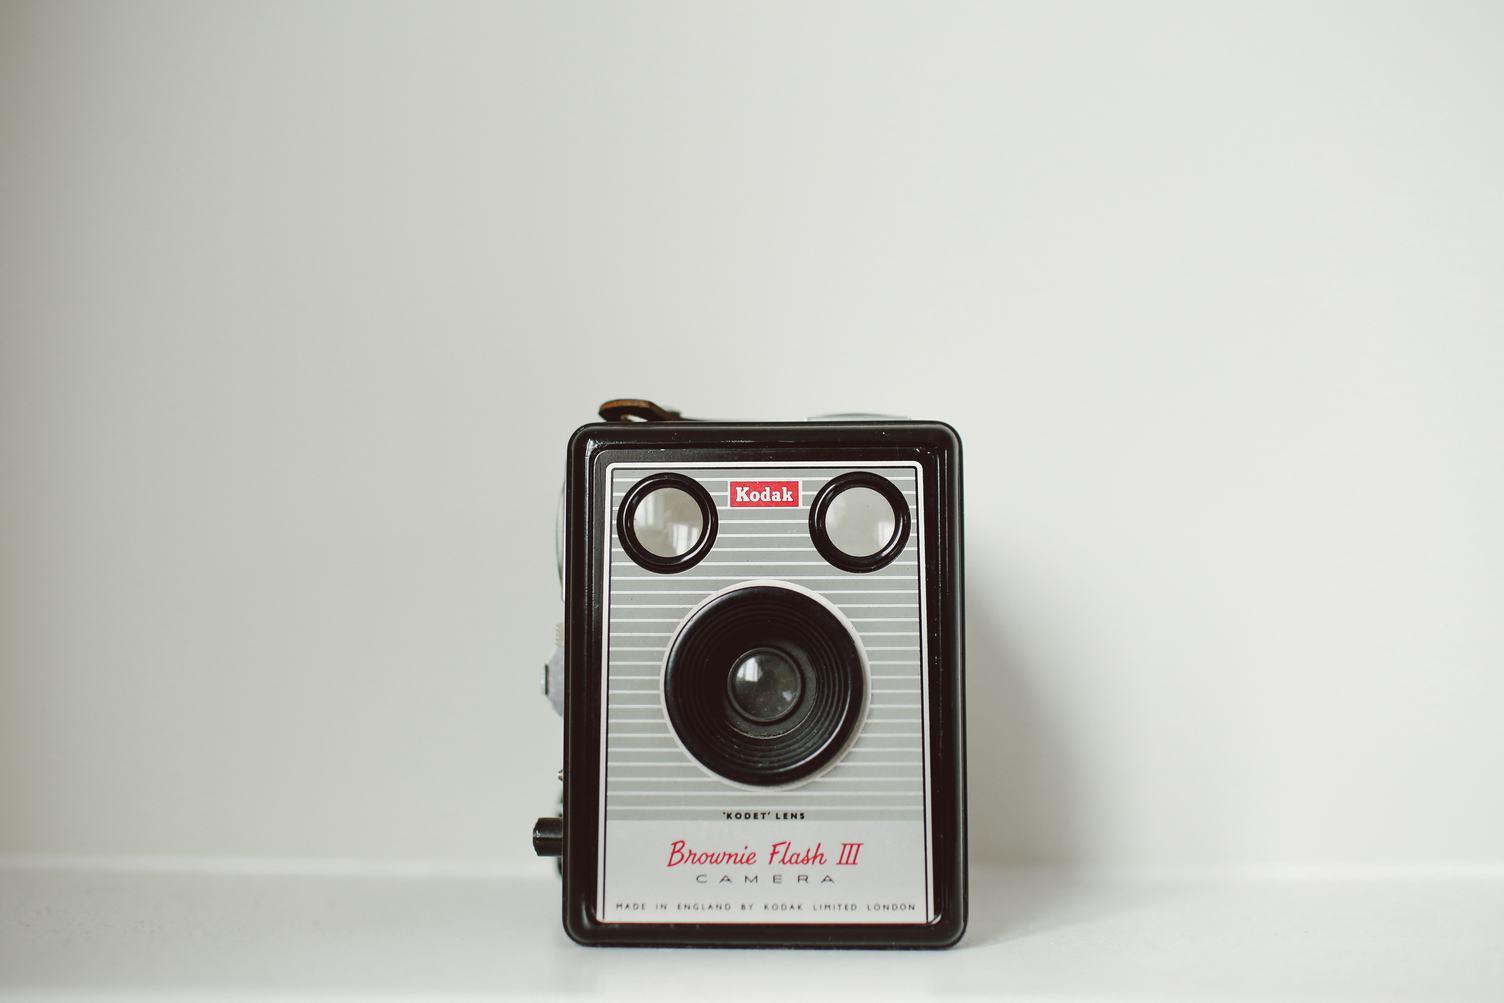 Brownie Flash III Kodak Camera on White Background